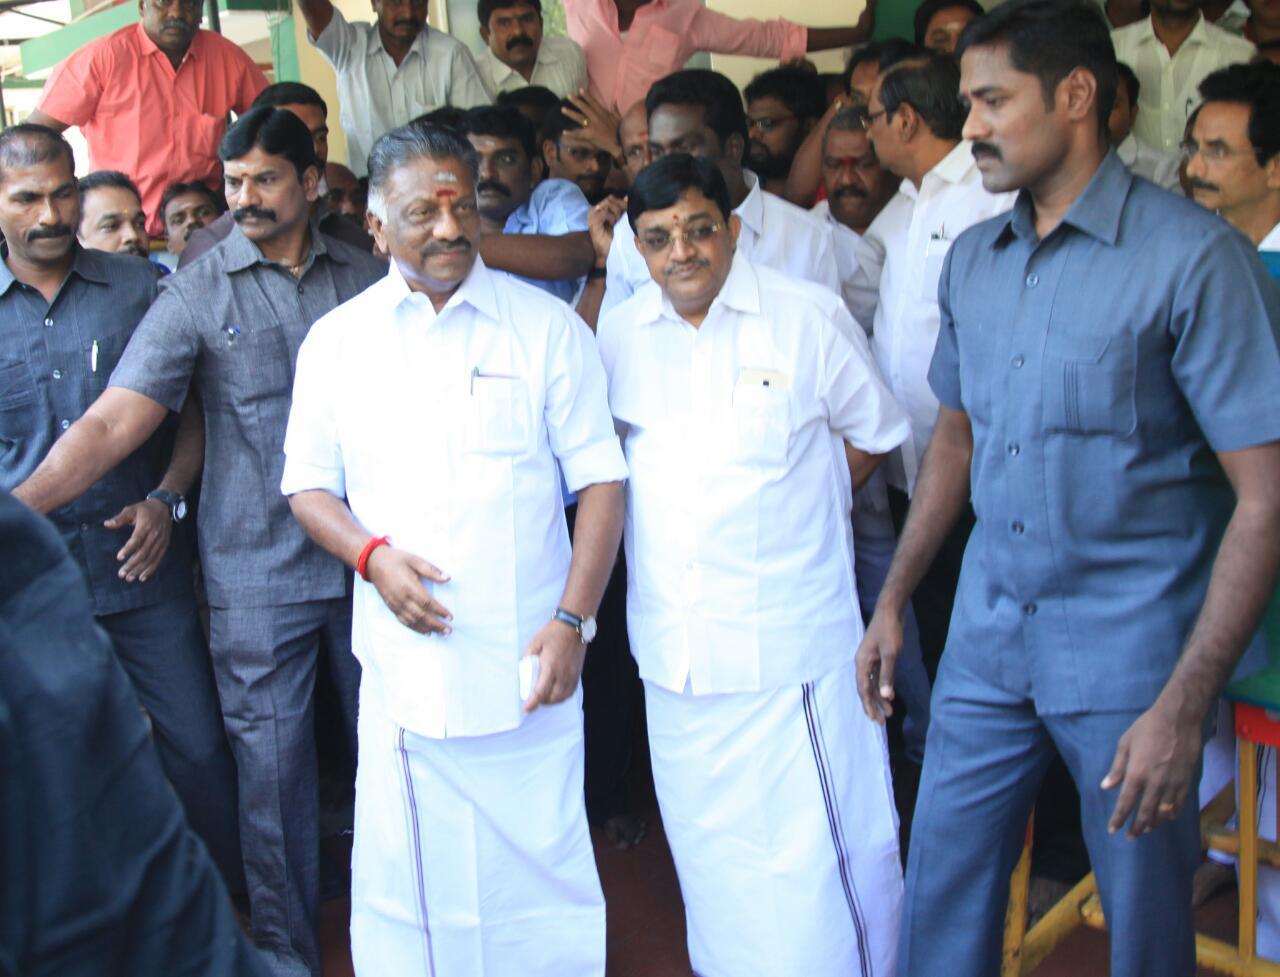 O.Panneerselvam goes to Kuvathur